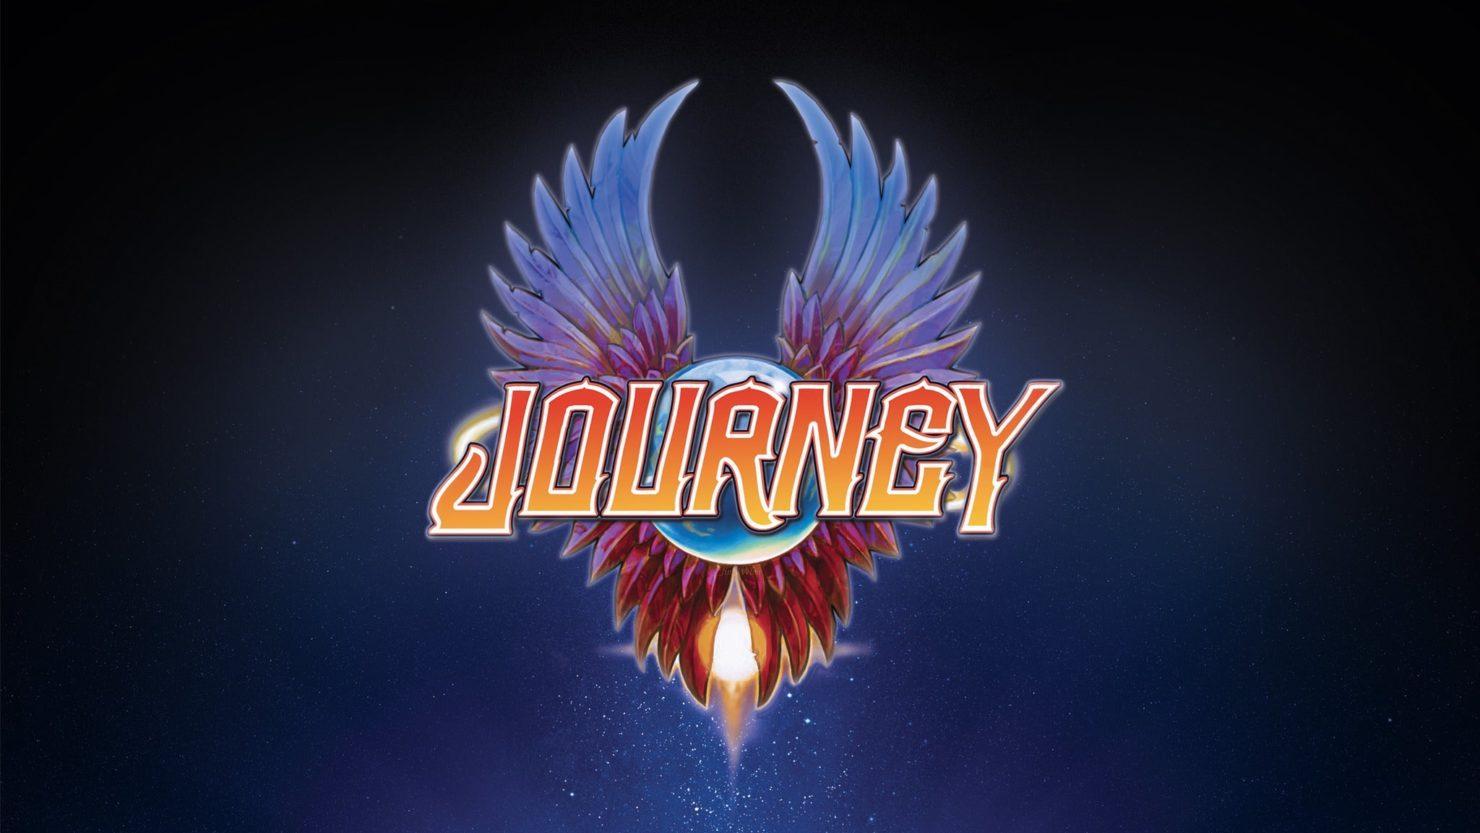 Journey at The Colosseum at Caesars Palace - Dec 30, 2019 - Las Vegas, NV